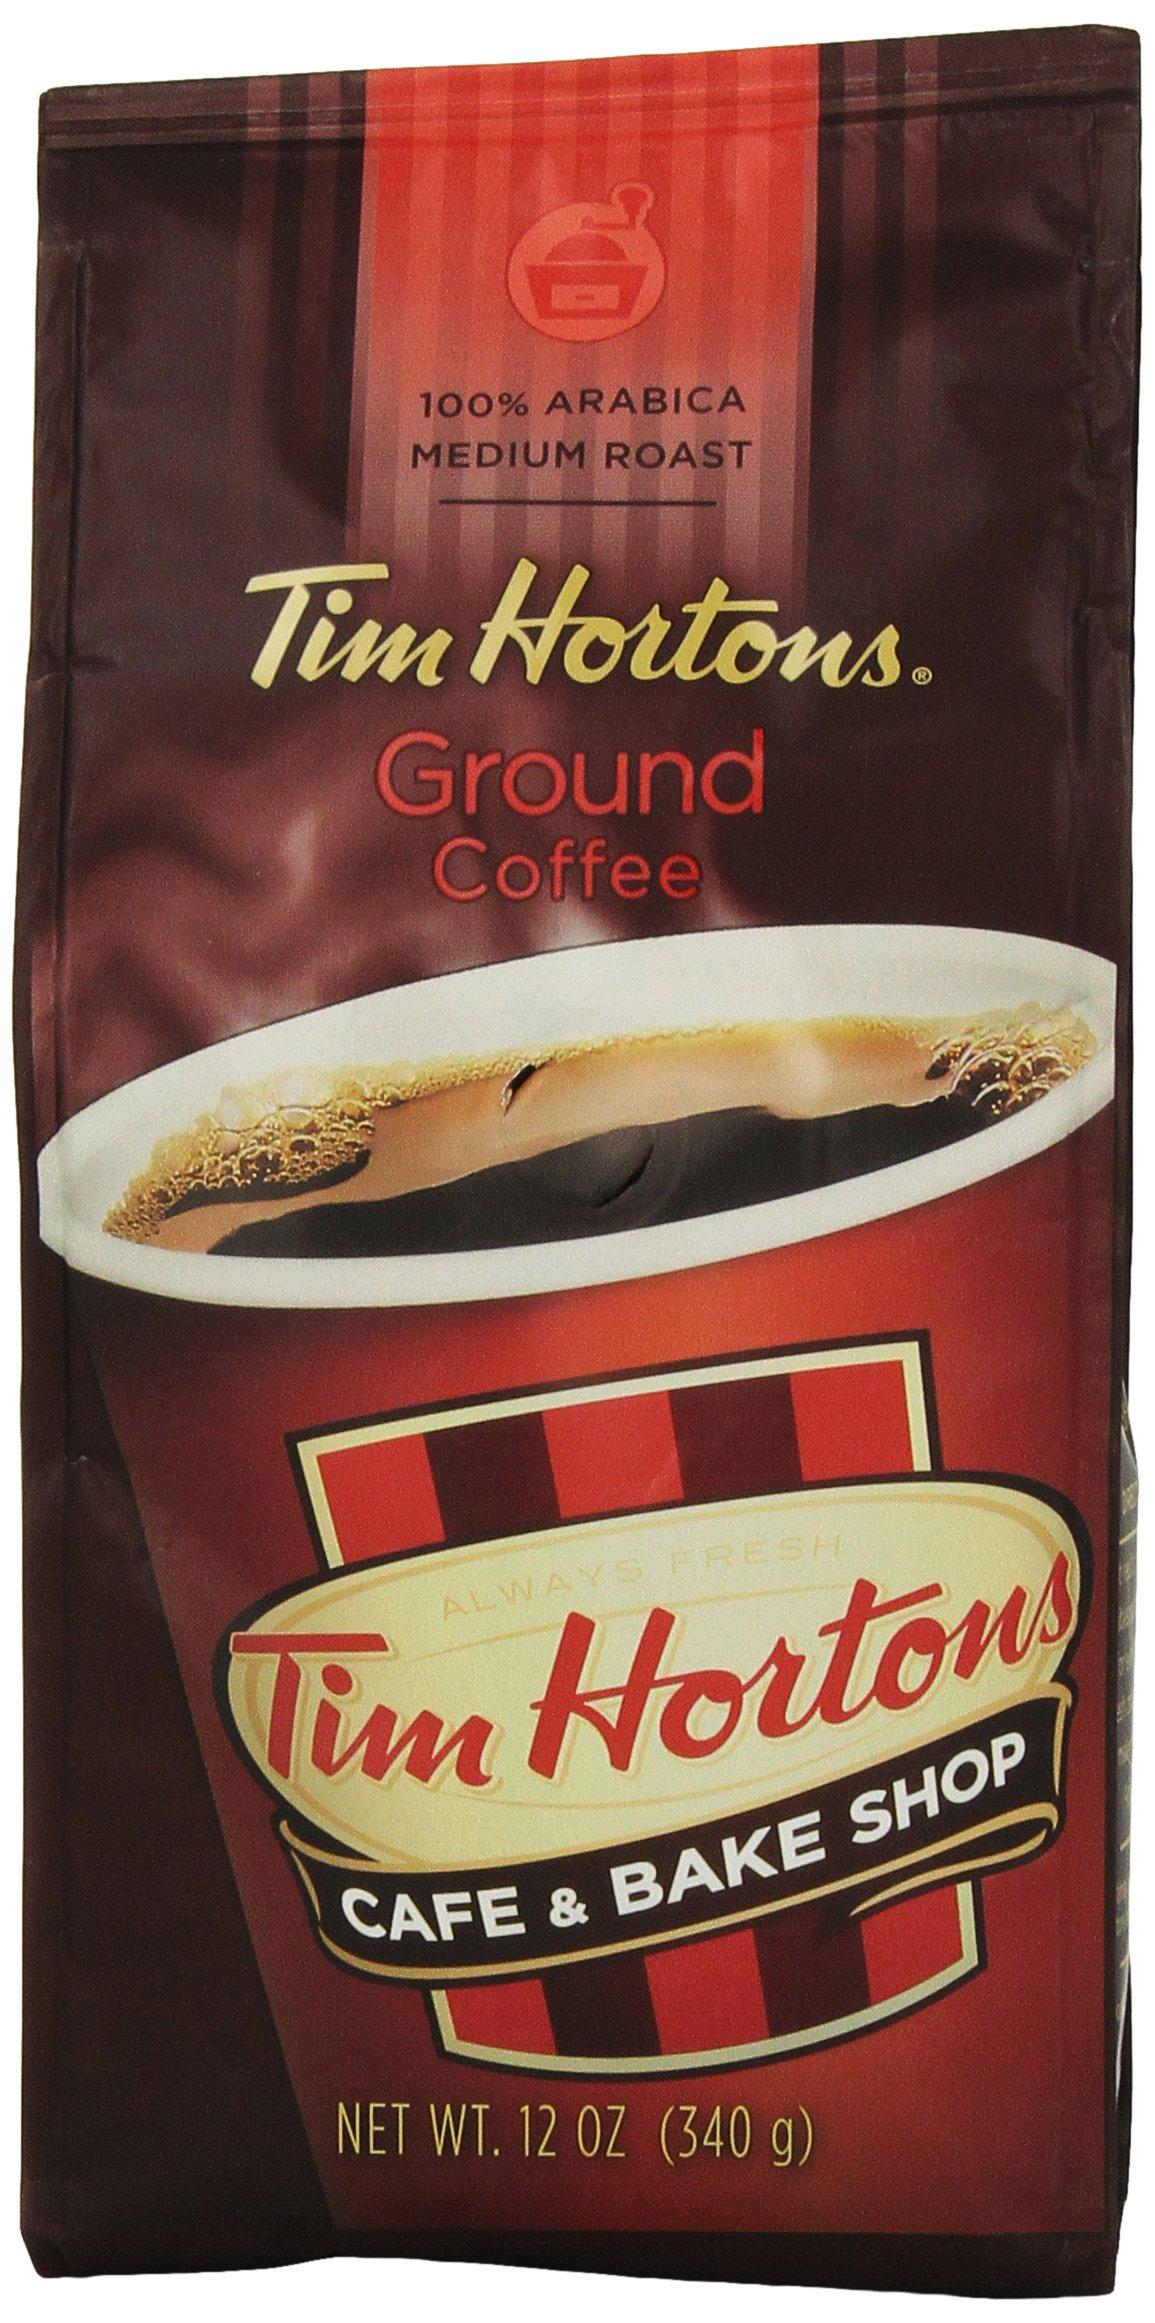 Tim Horton's 100% Arabica Medium Roast Original Blend Ground Coffee, 12 Ounce